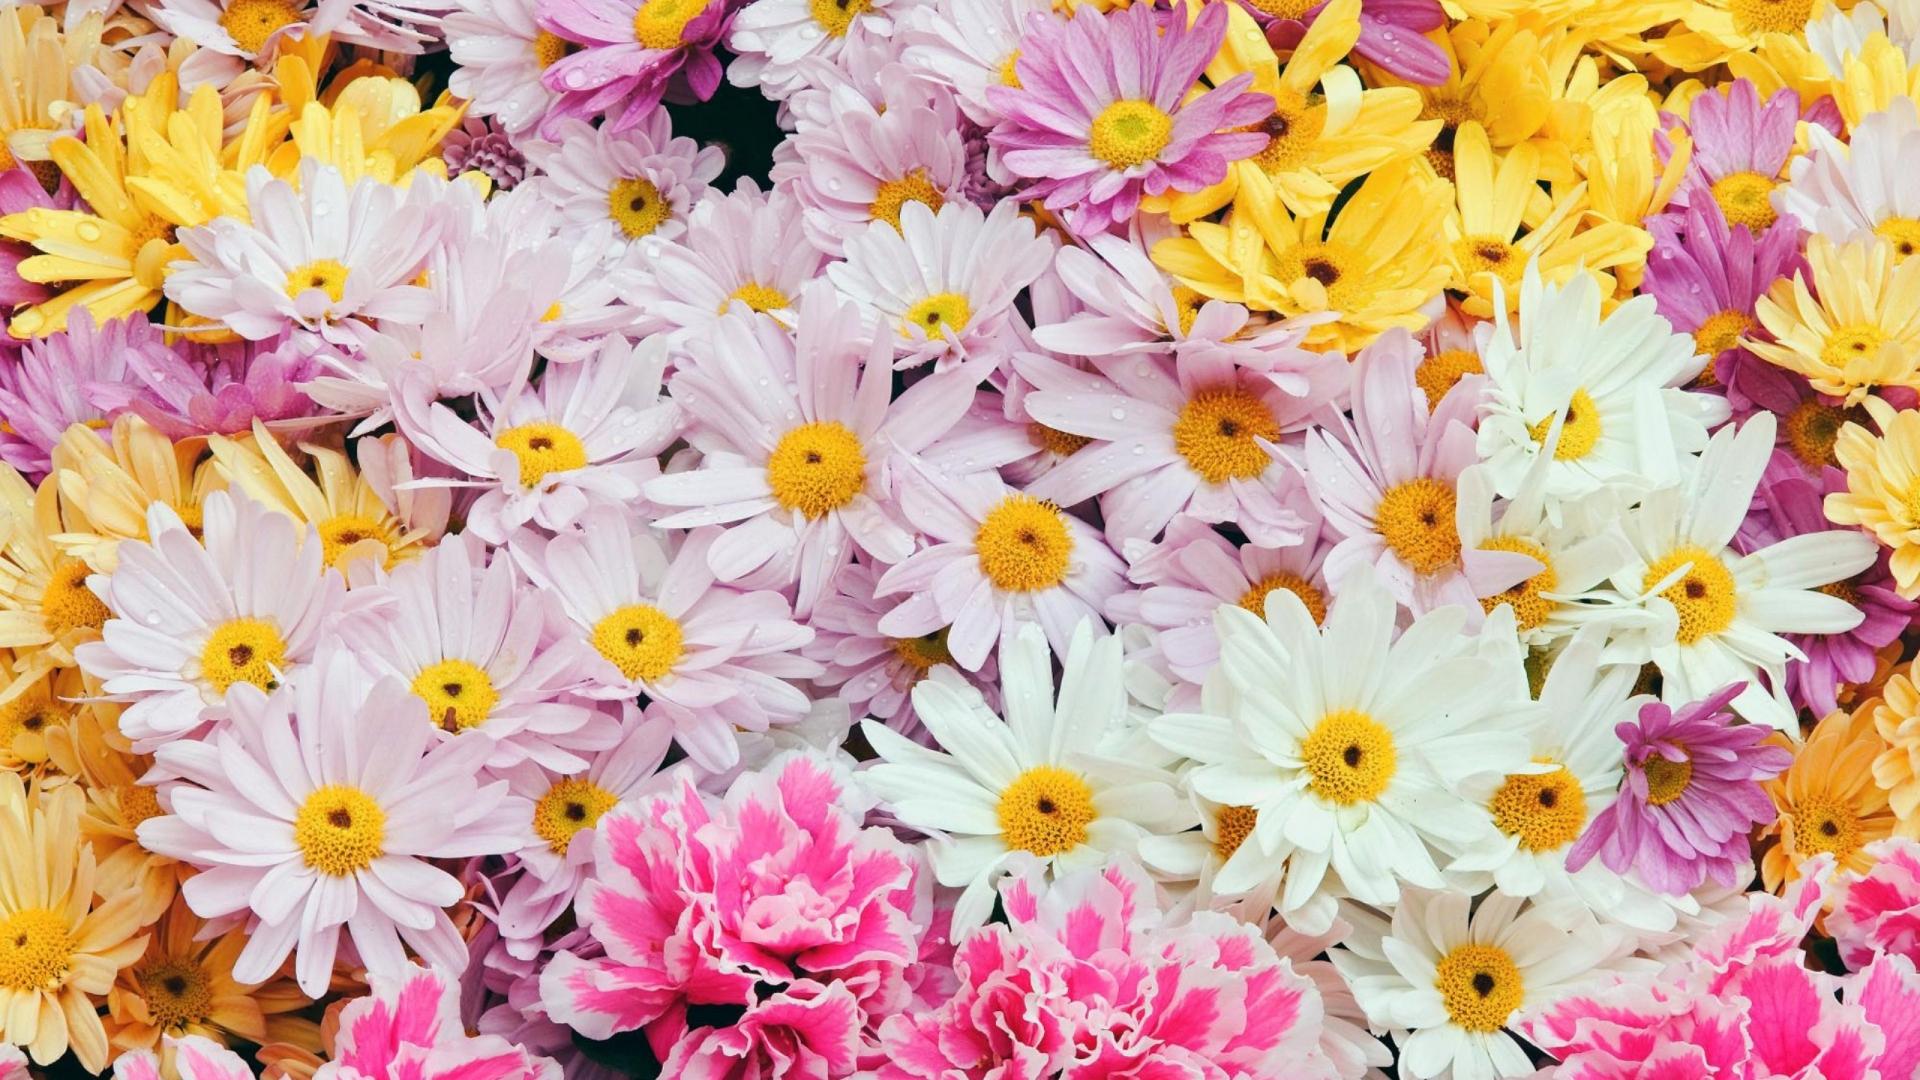 Flores margaritas de colores - 1920x1080